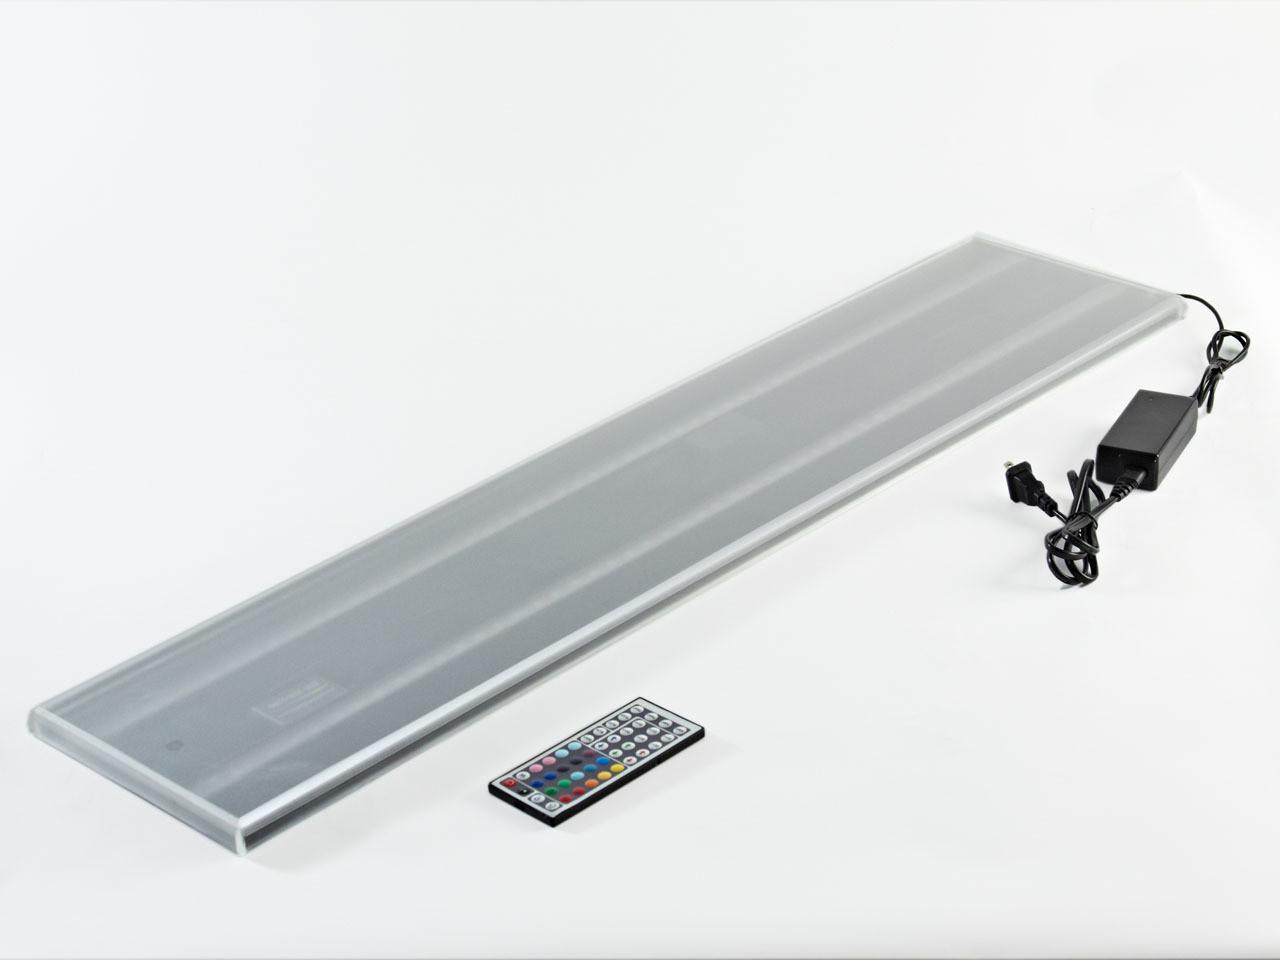 LED LIQUOR SHELF Flat Panel Glorifier - DOUBLE WIDE - Dual Width Modular Bar Display